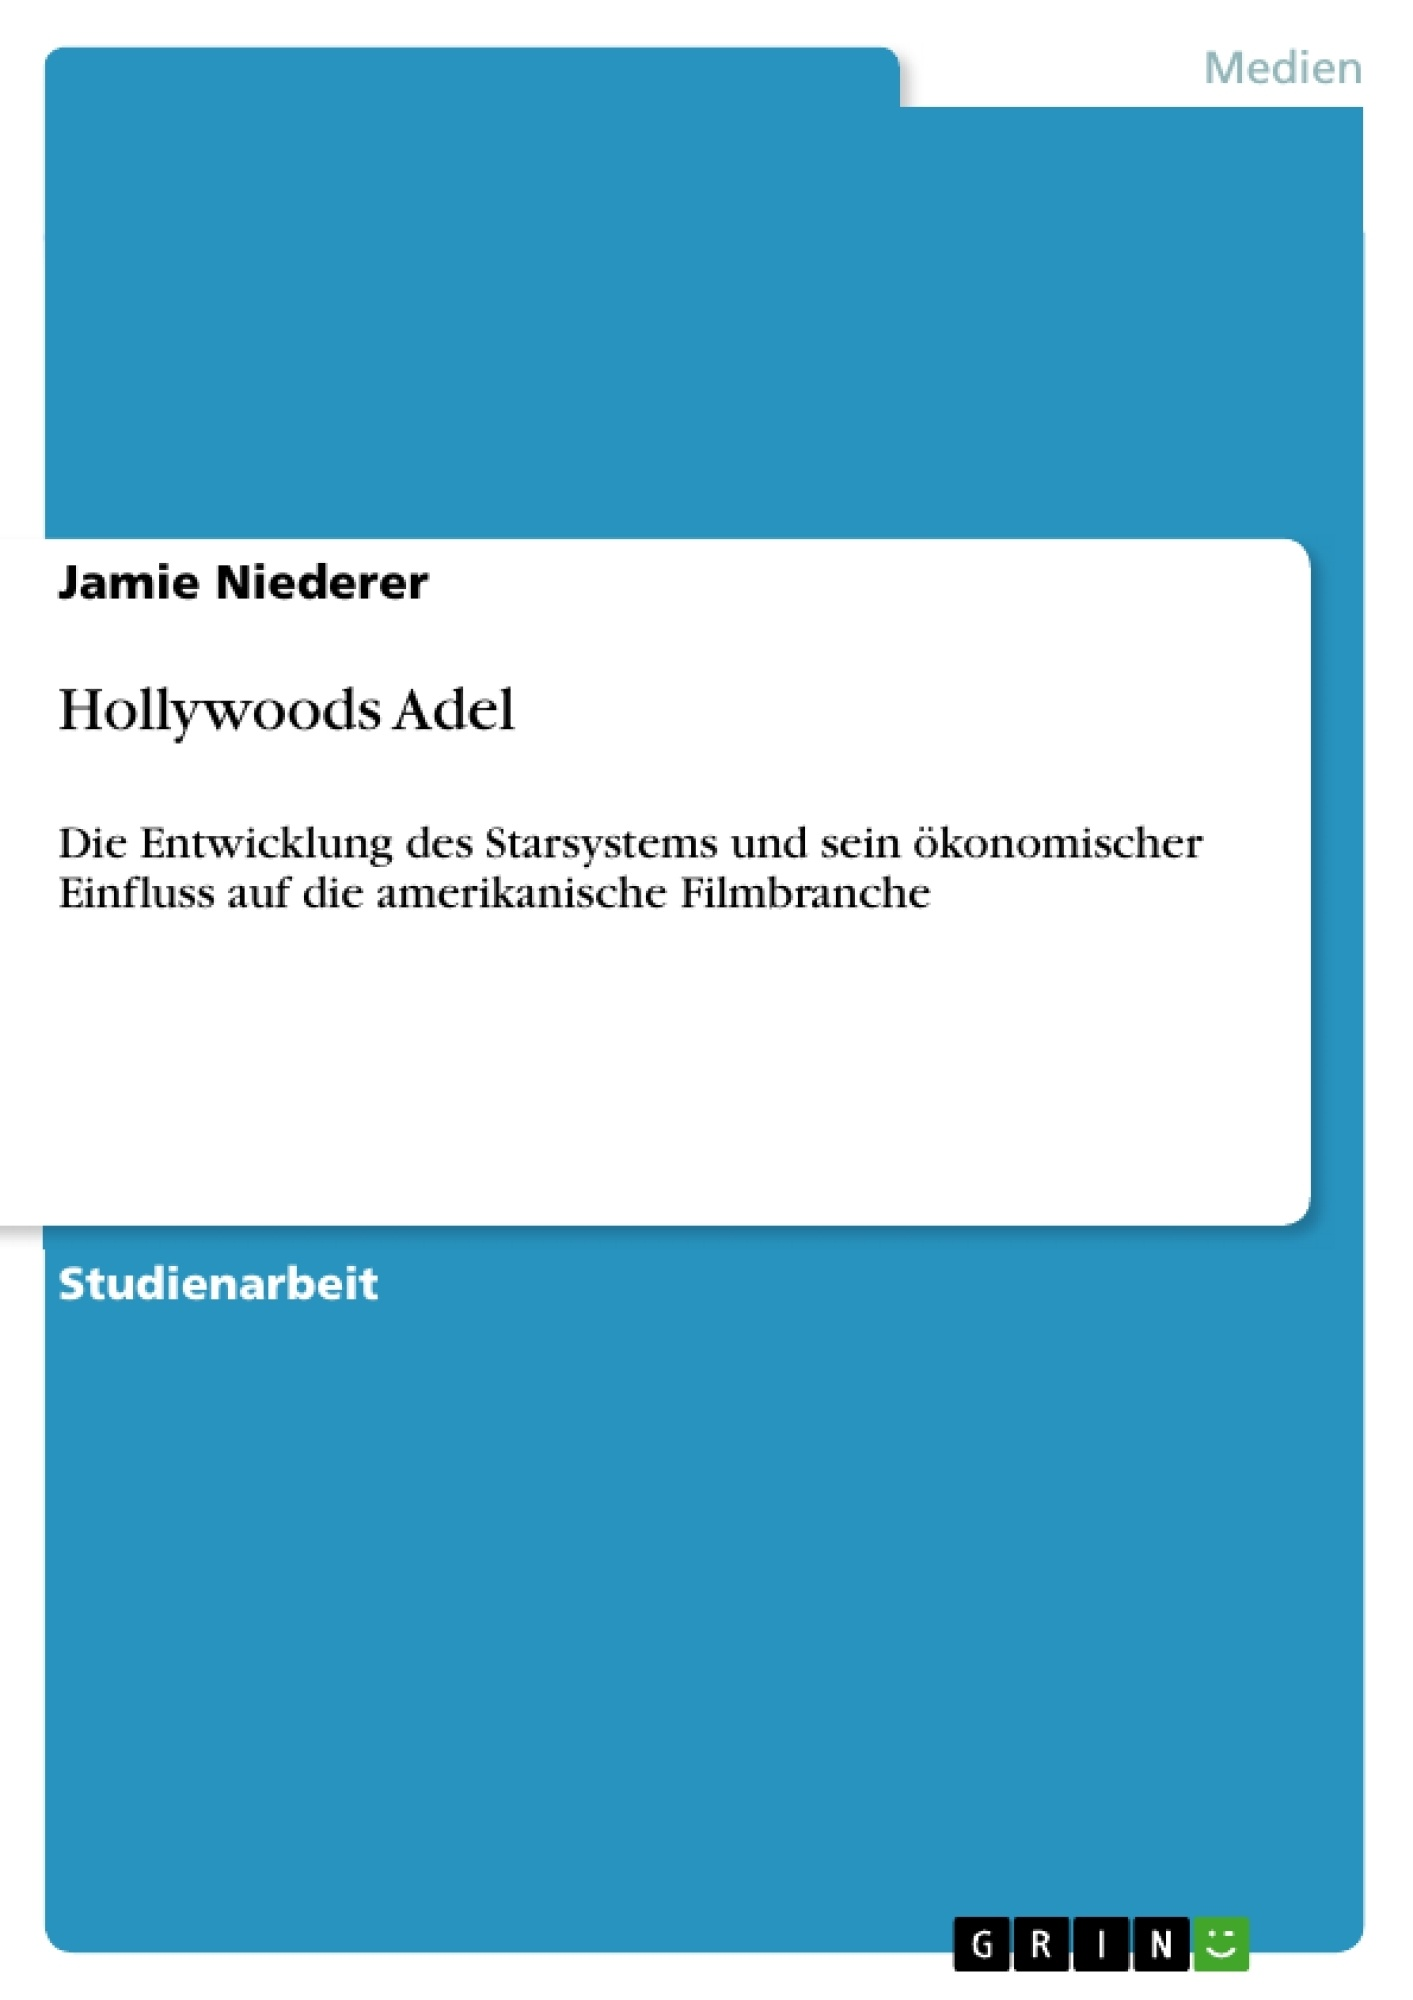 Titel: Hollywoods Adel